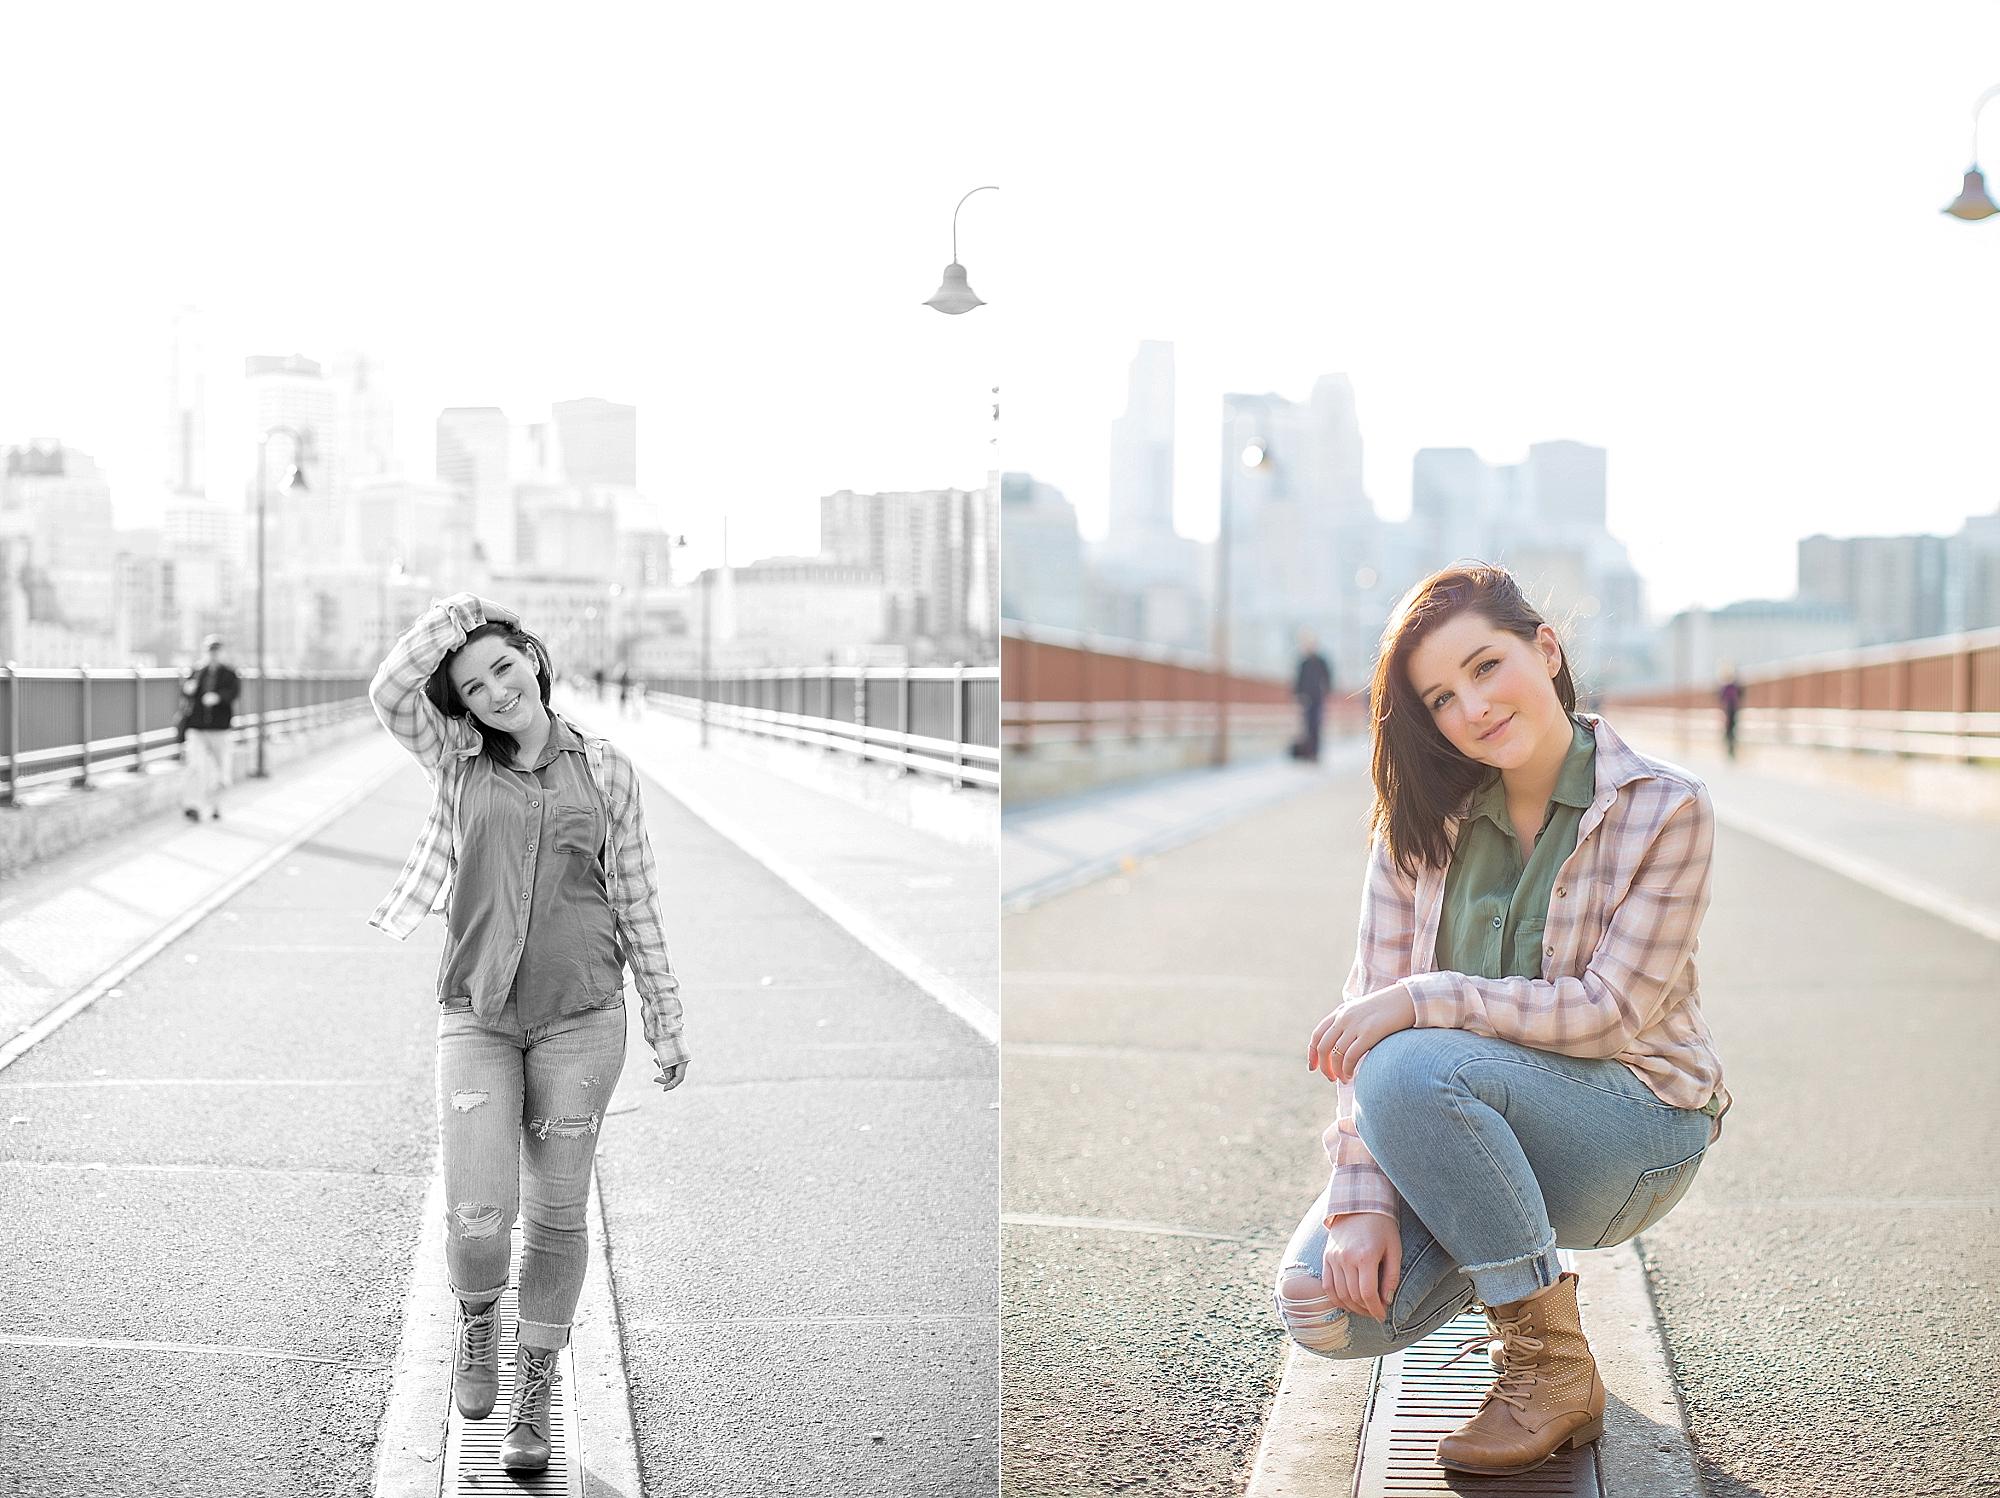 Minneapolis Potrait Studio Brio Art,Studio Photographer Katie Fears,high school senior photos,minneapolis senior photos,minnesota senior portrait photographer,senior photos,senior pics,st. paul senior portraits,